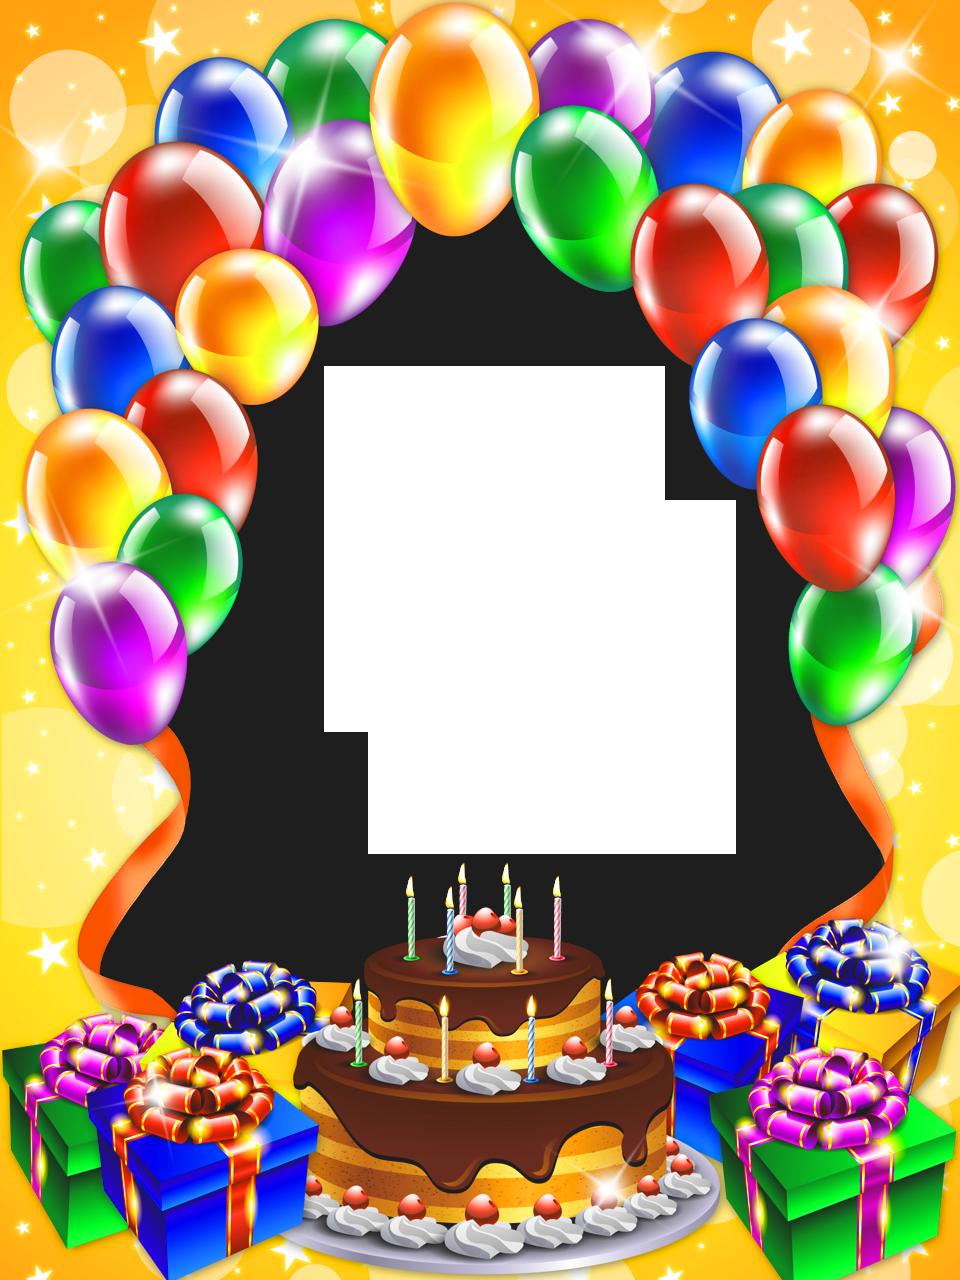 happy birthday frame clipart